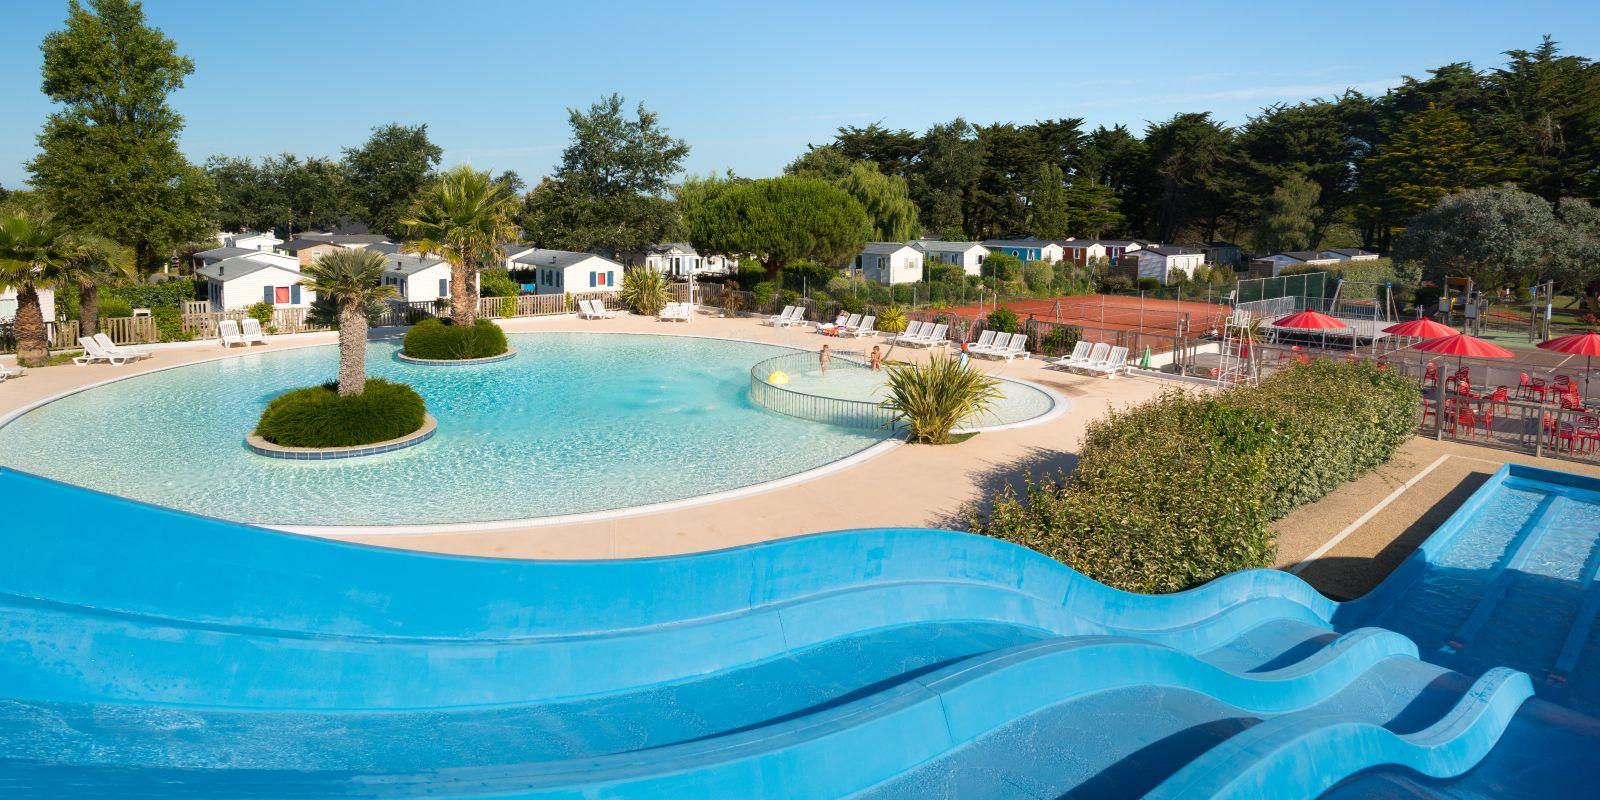 Camping en bretagne sud avec piscine et toboggan village for Camping quend plage avec piscine